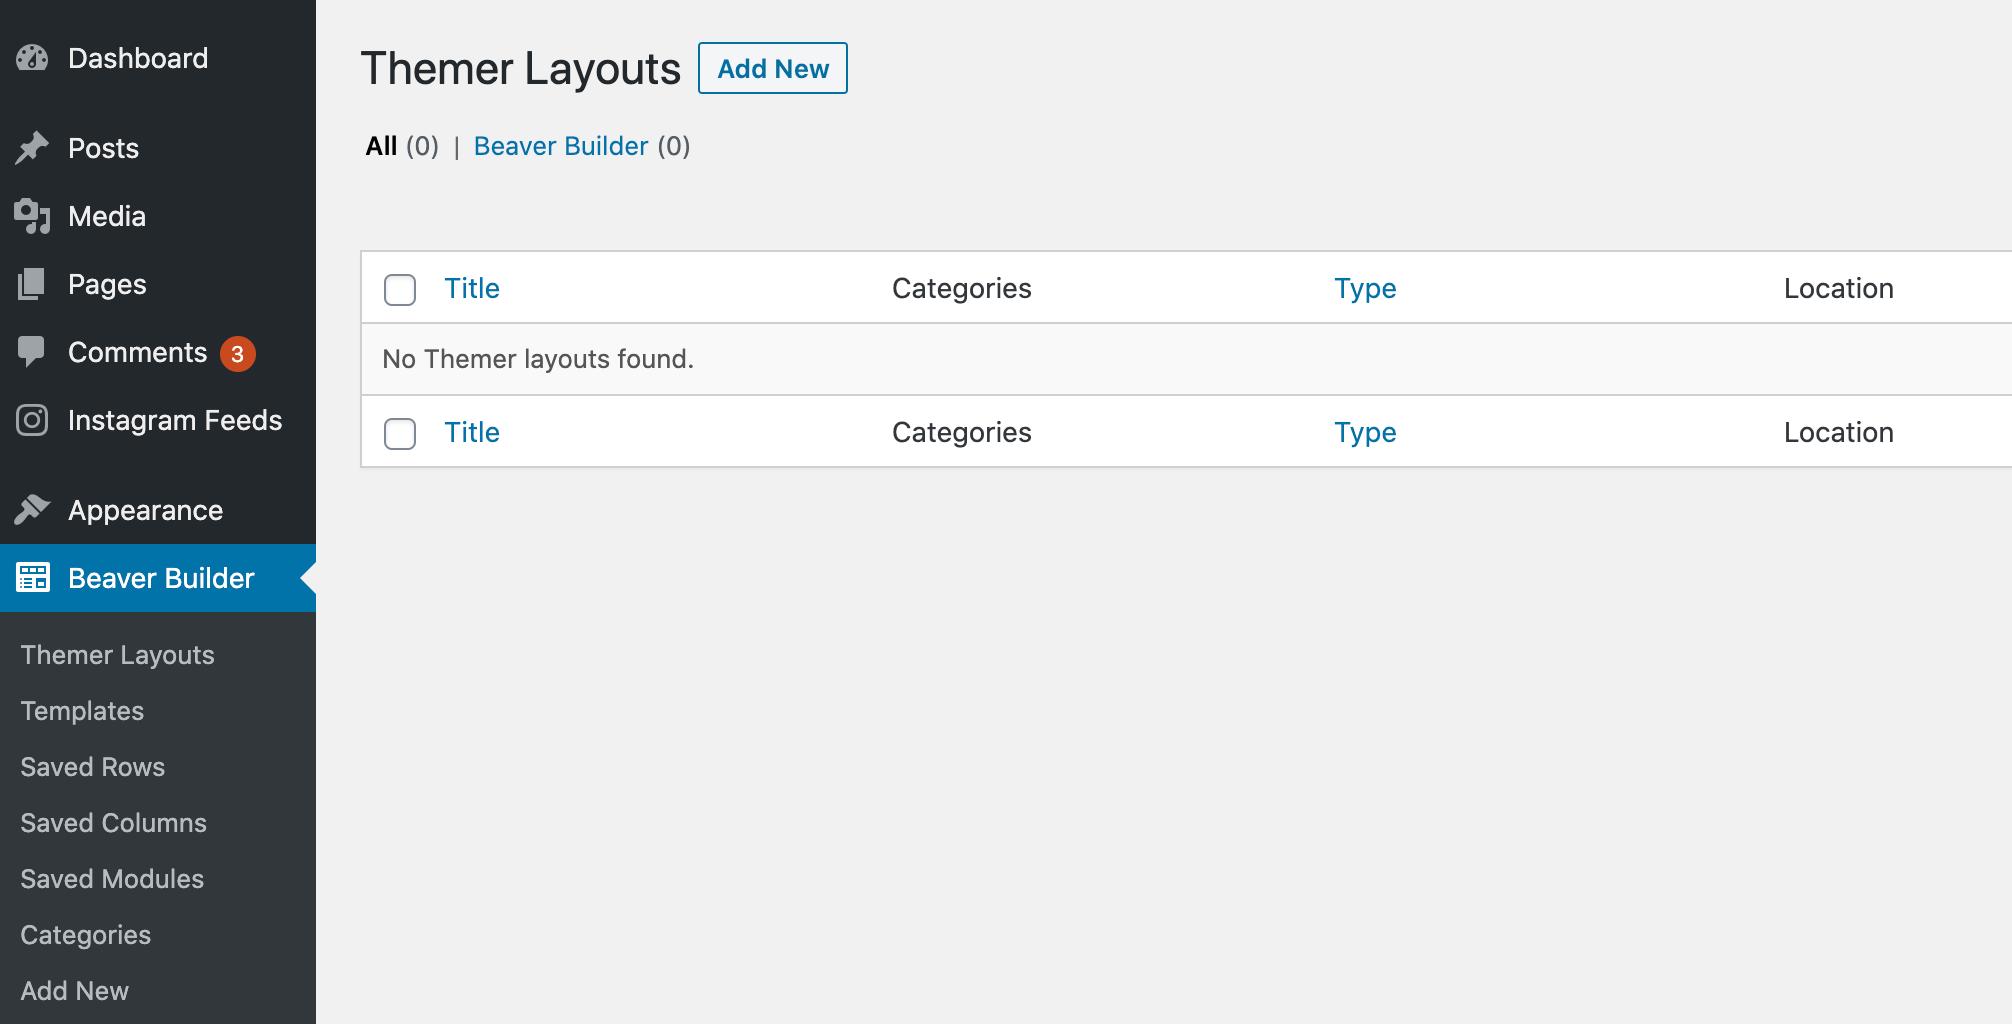 The Themer Layouts screen in the WordPress dashboard.